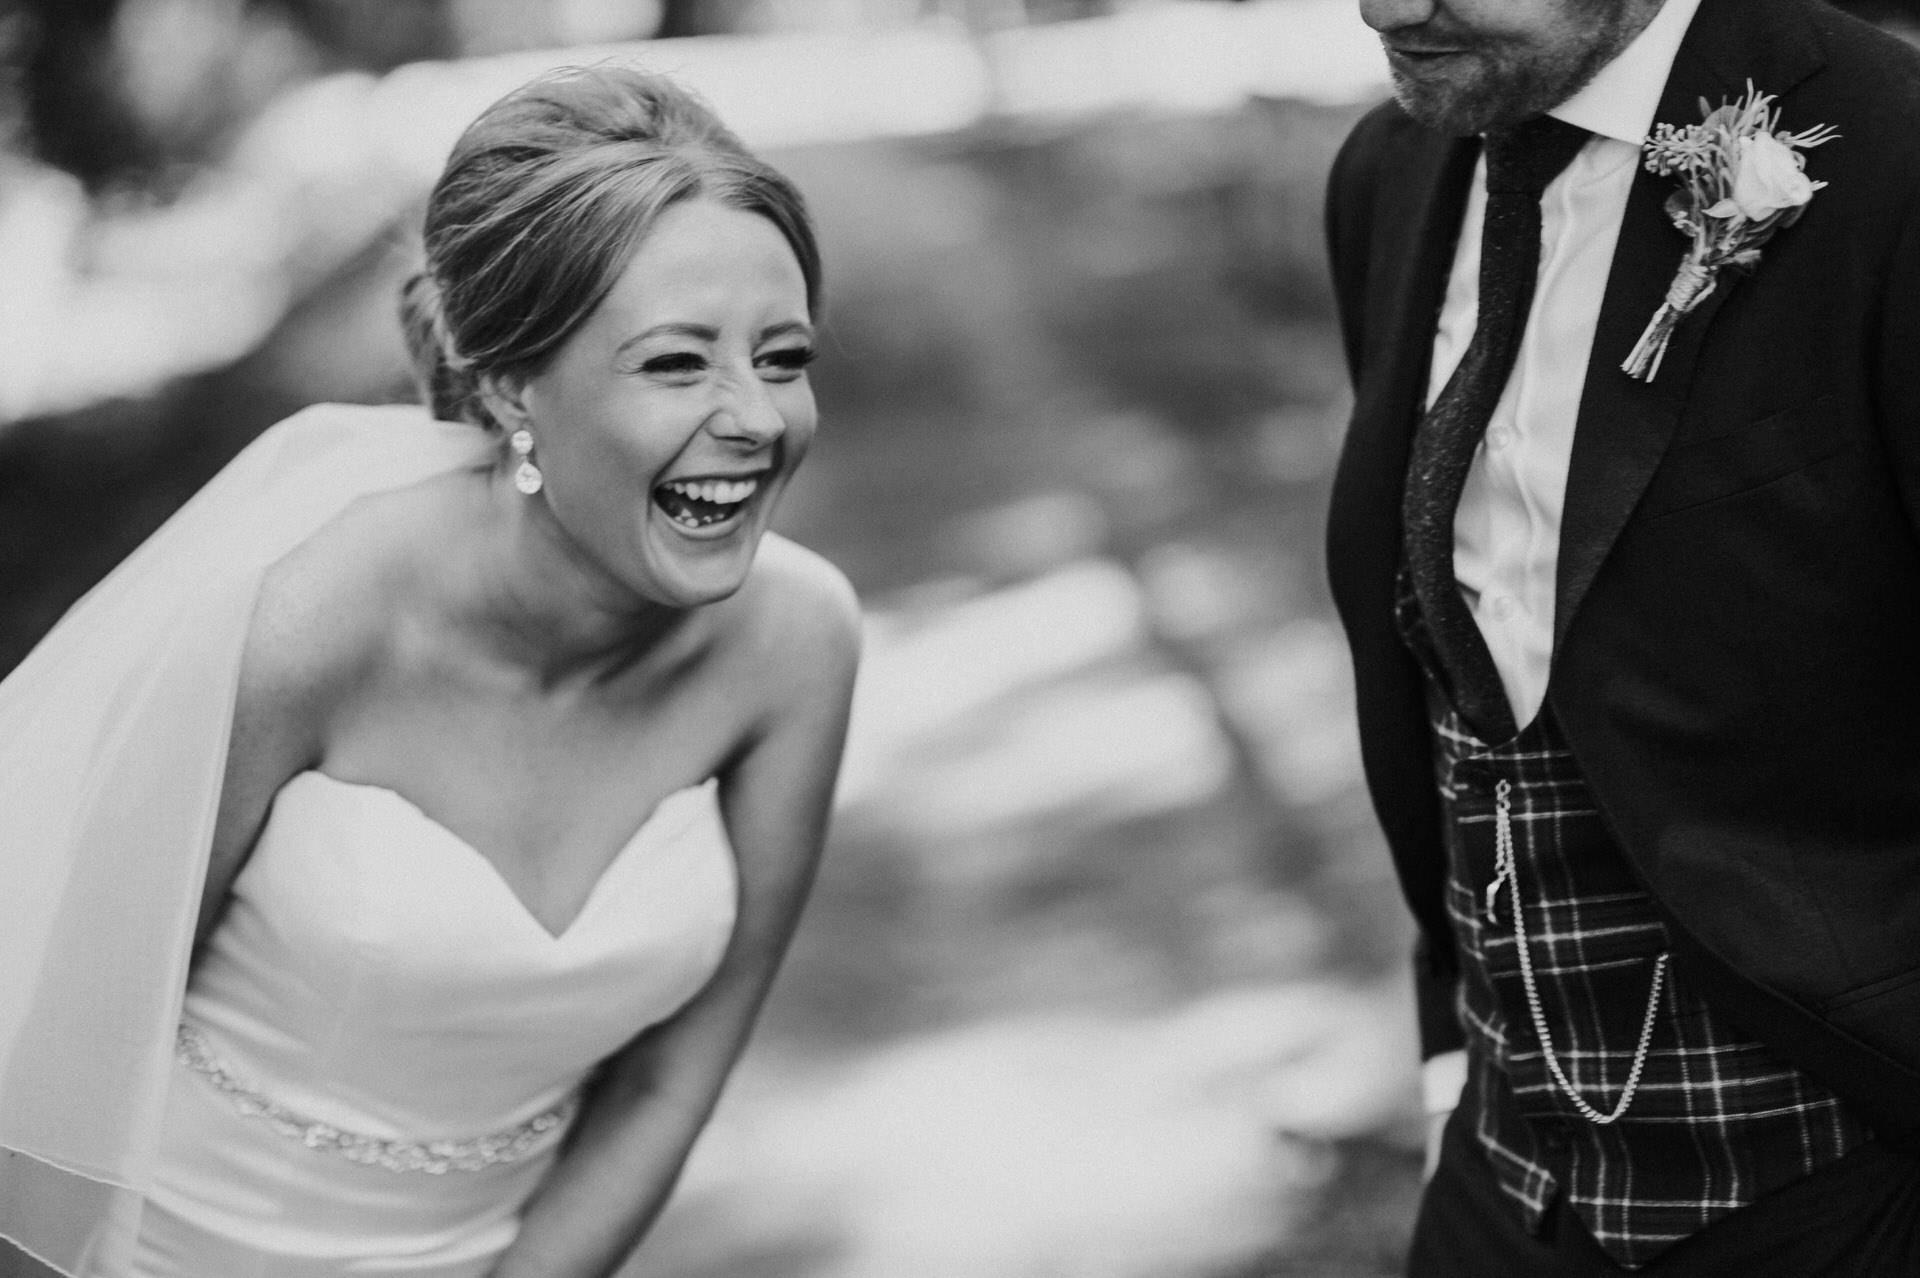 Maunsel house wedding photography 29 wedding portrait